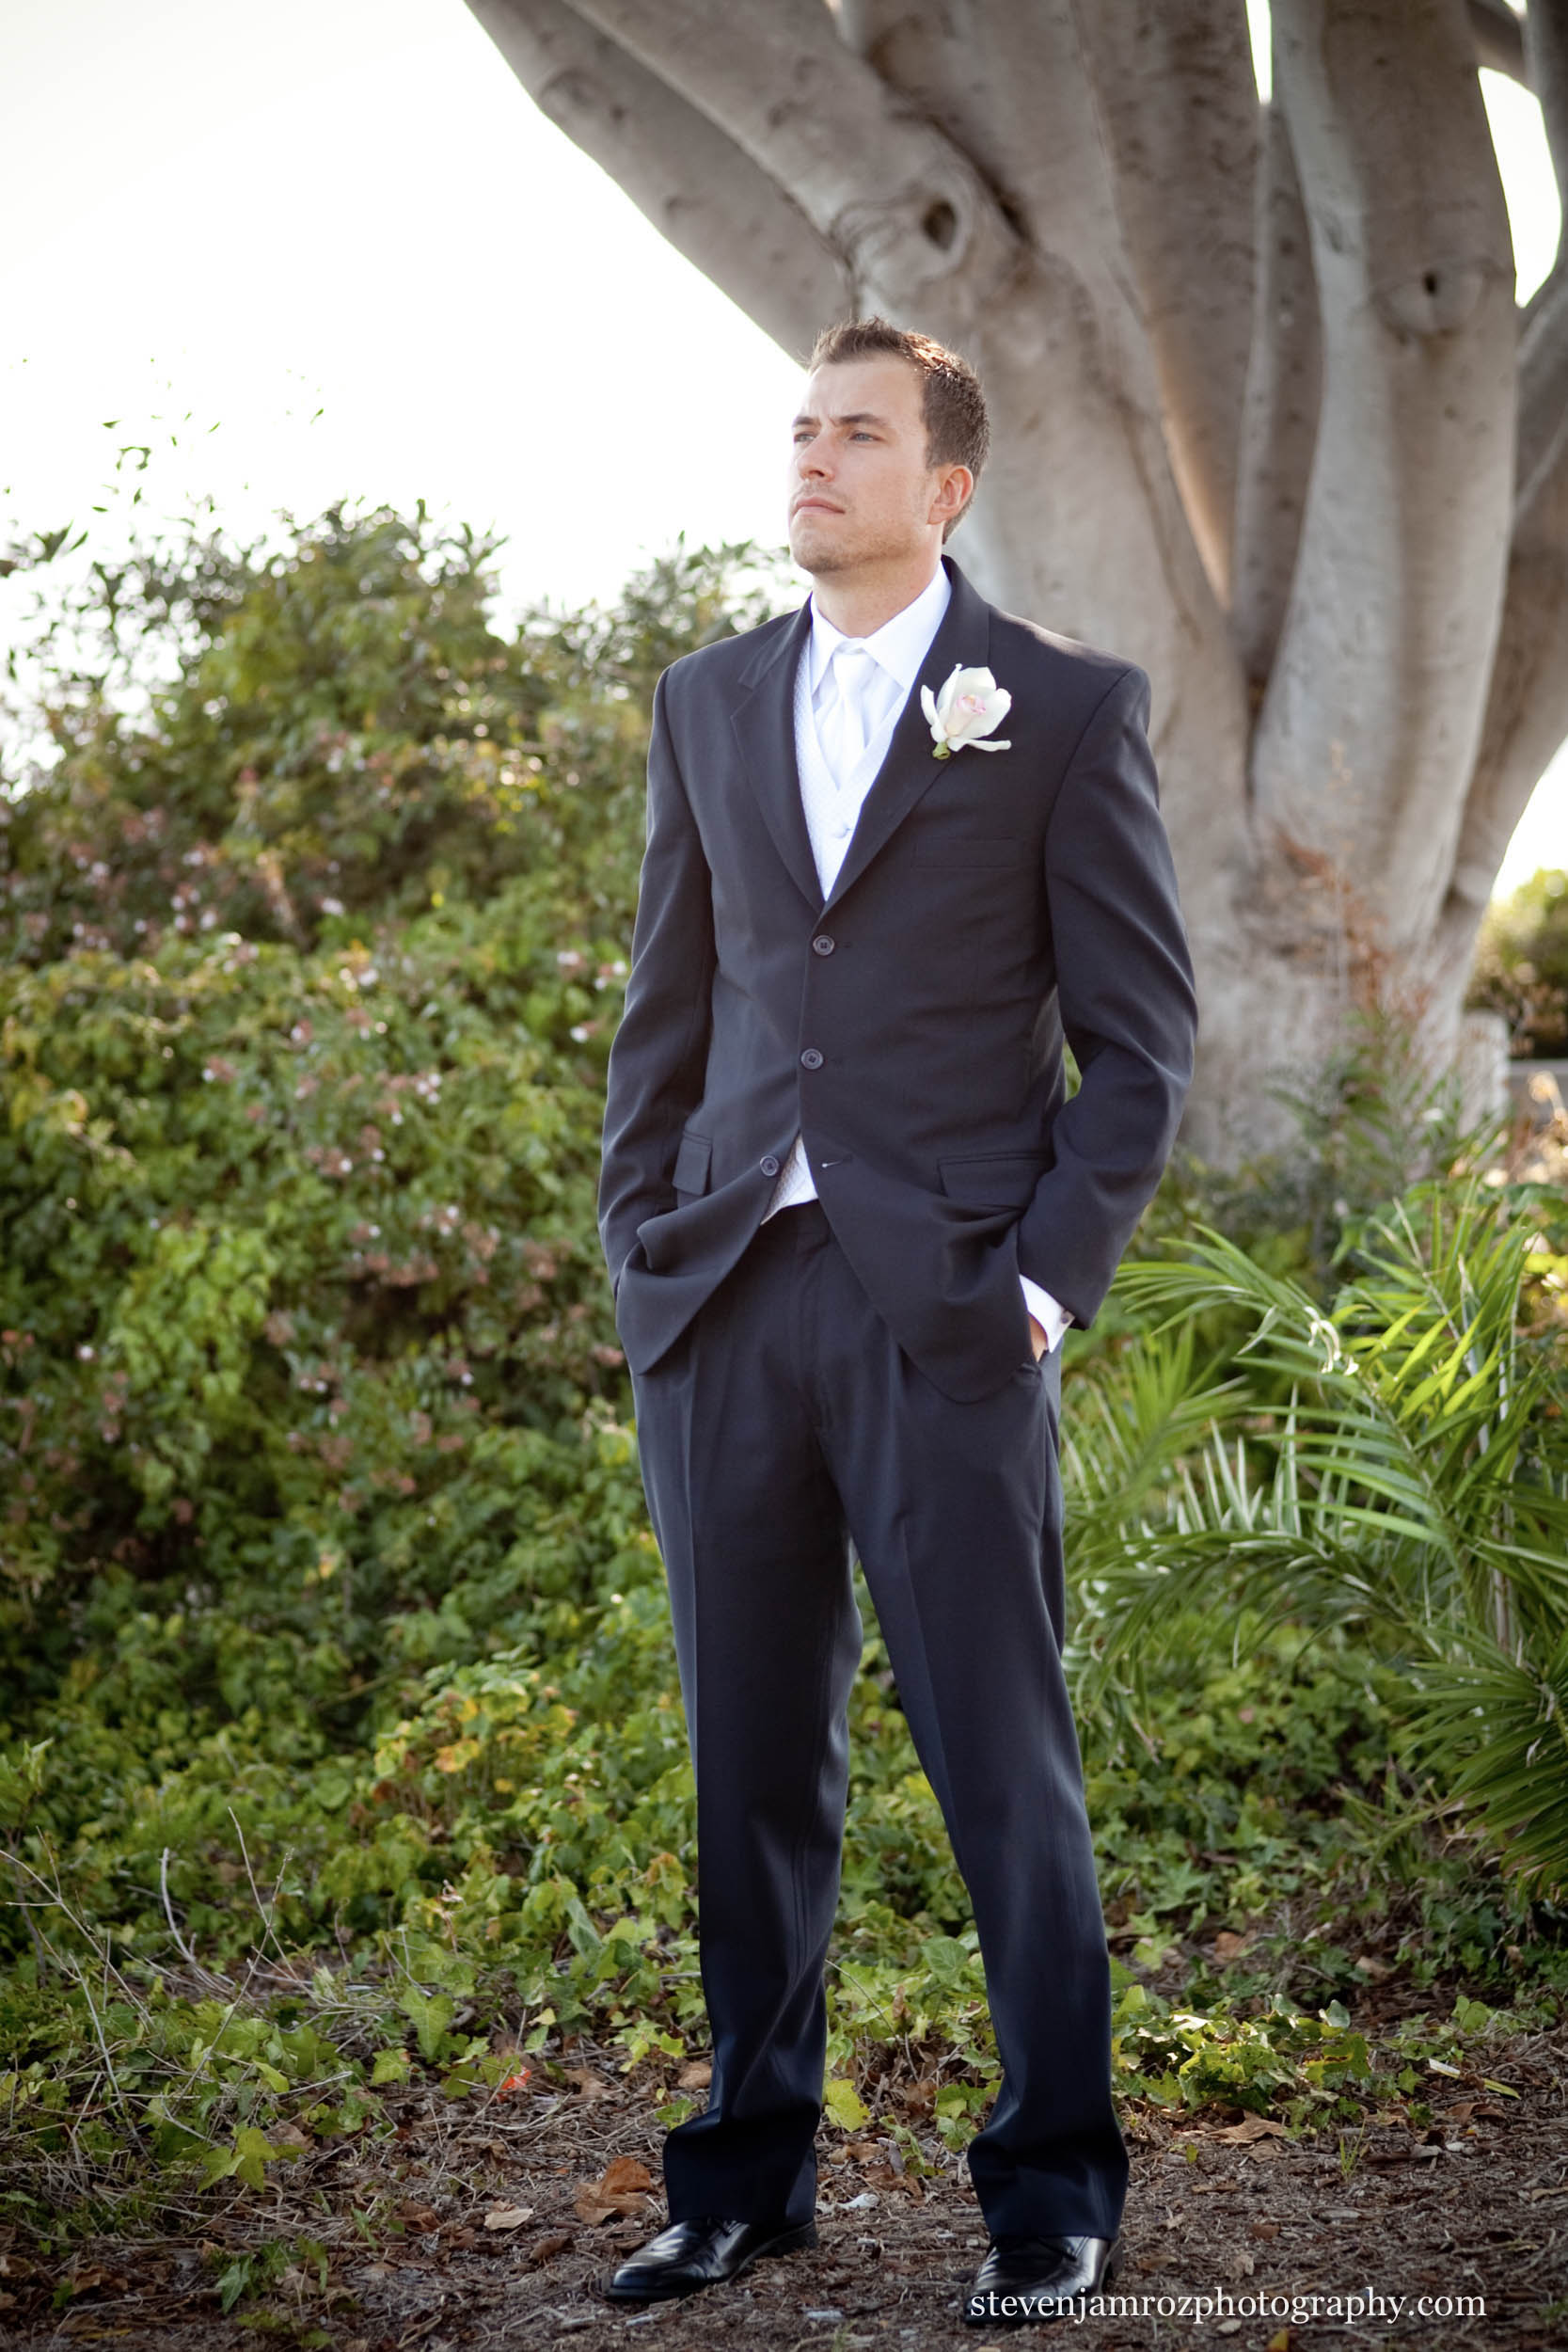 blue-suit-groom-portrait-raleigh-nc-steven-jamroz-photography-0062.jpg